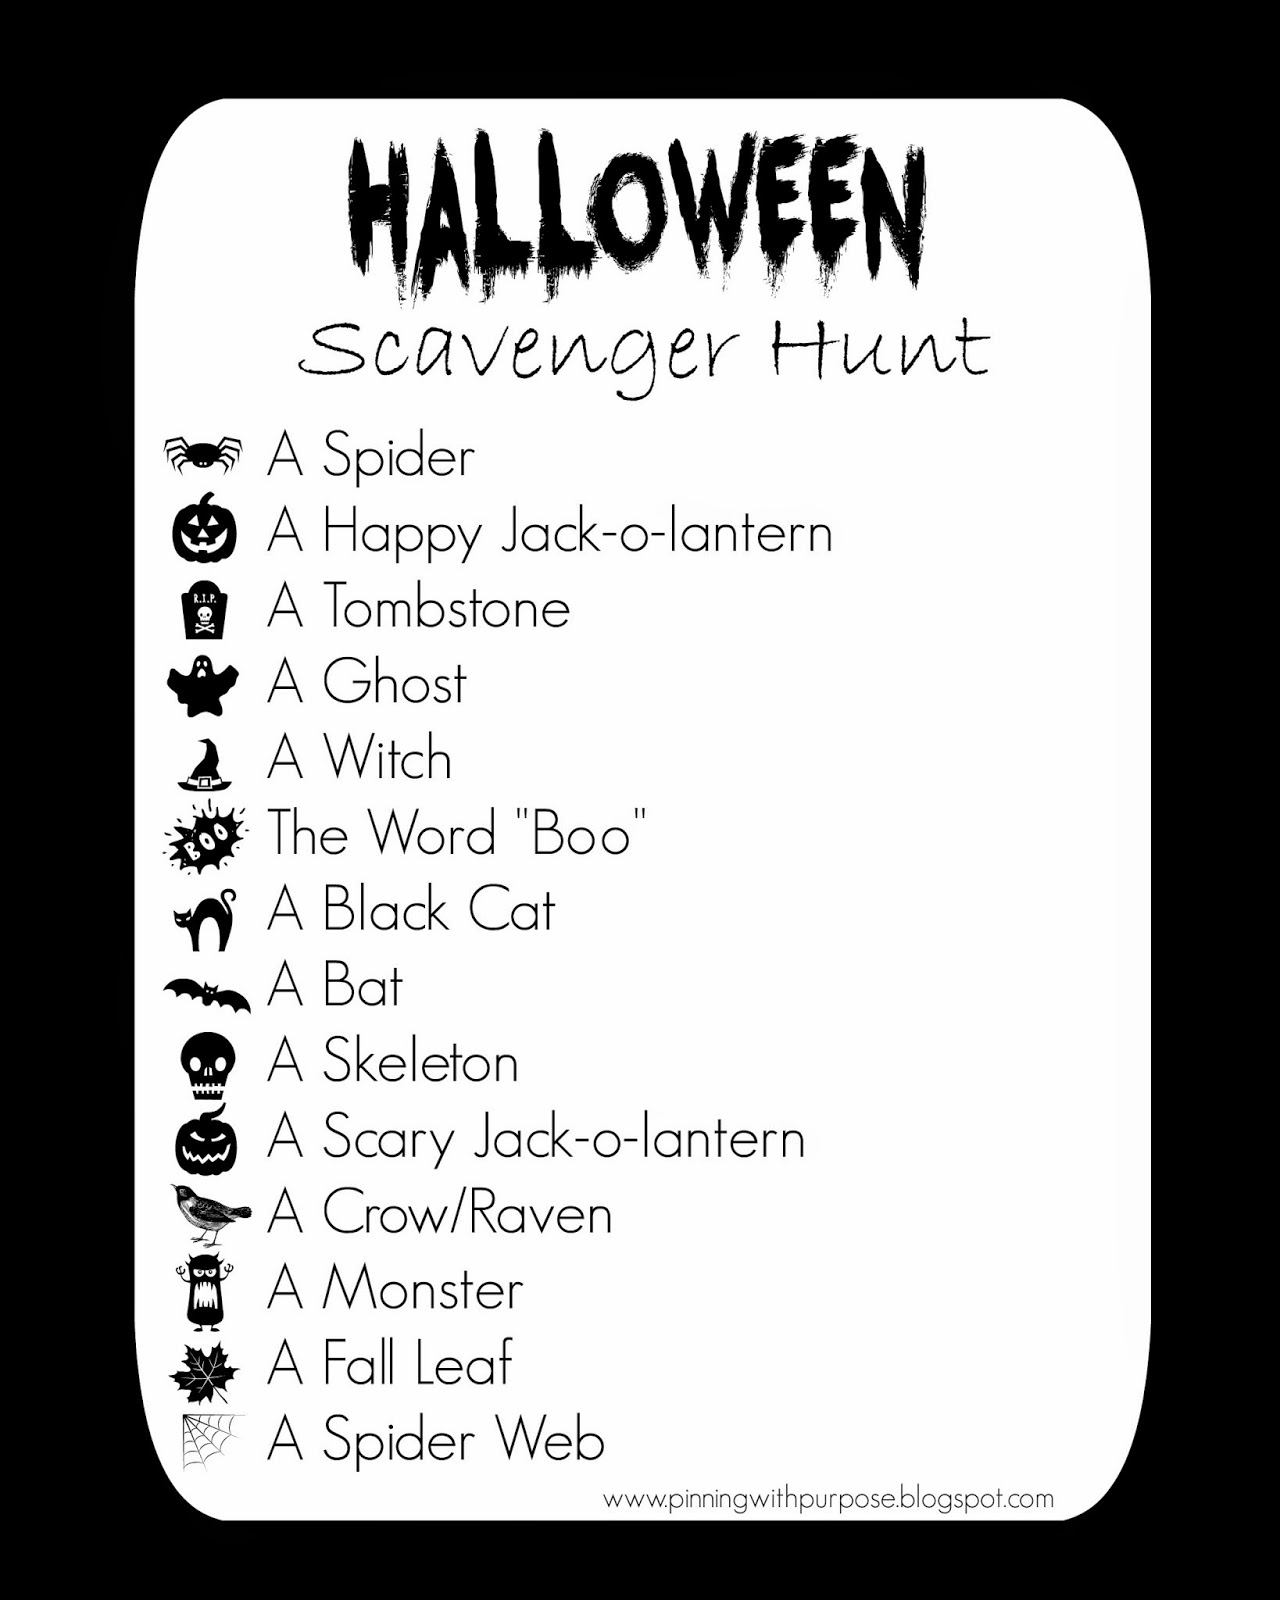 Pinning With Purpose Neighborhood Halloween Scavenger Hunt